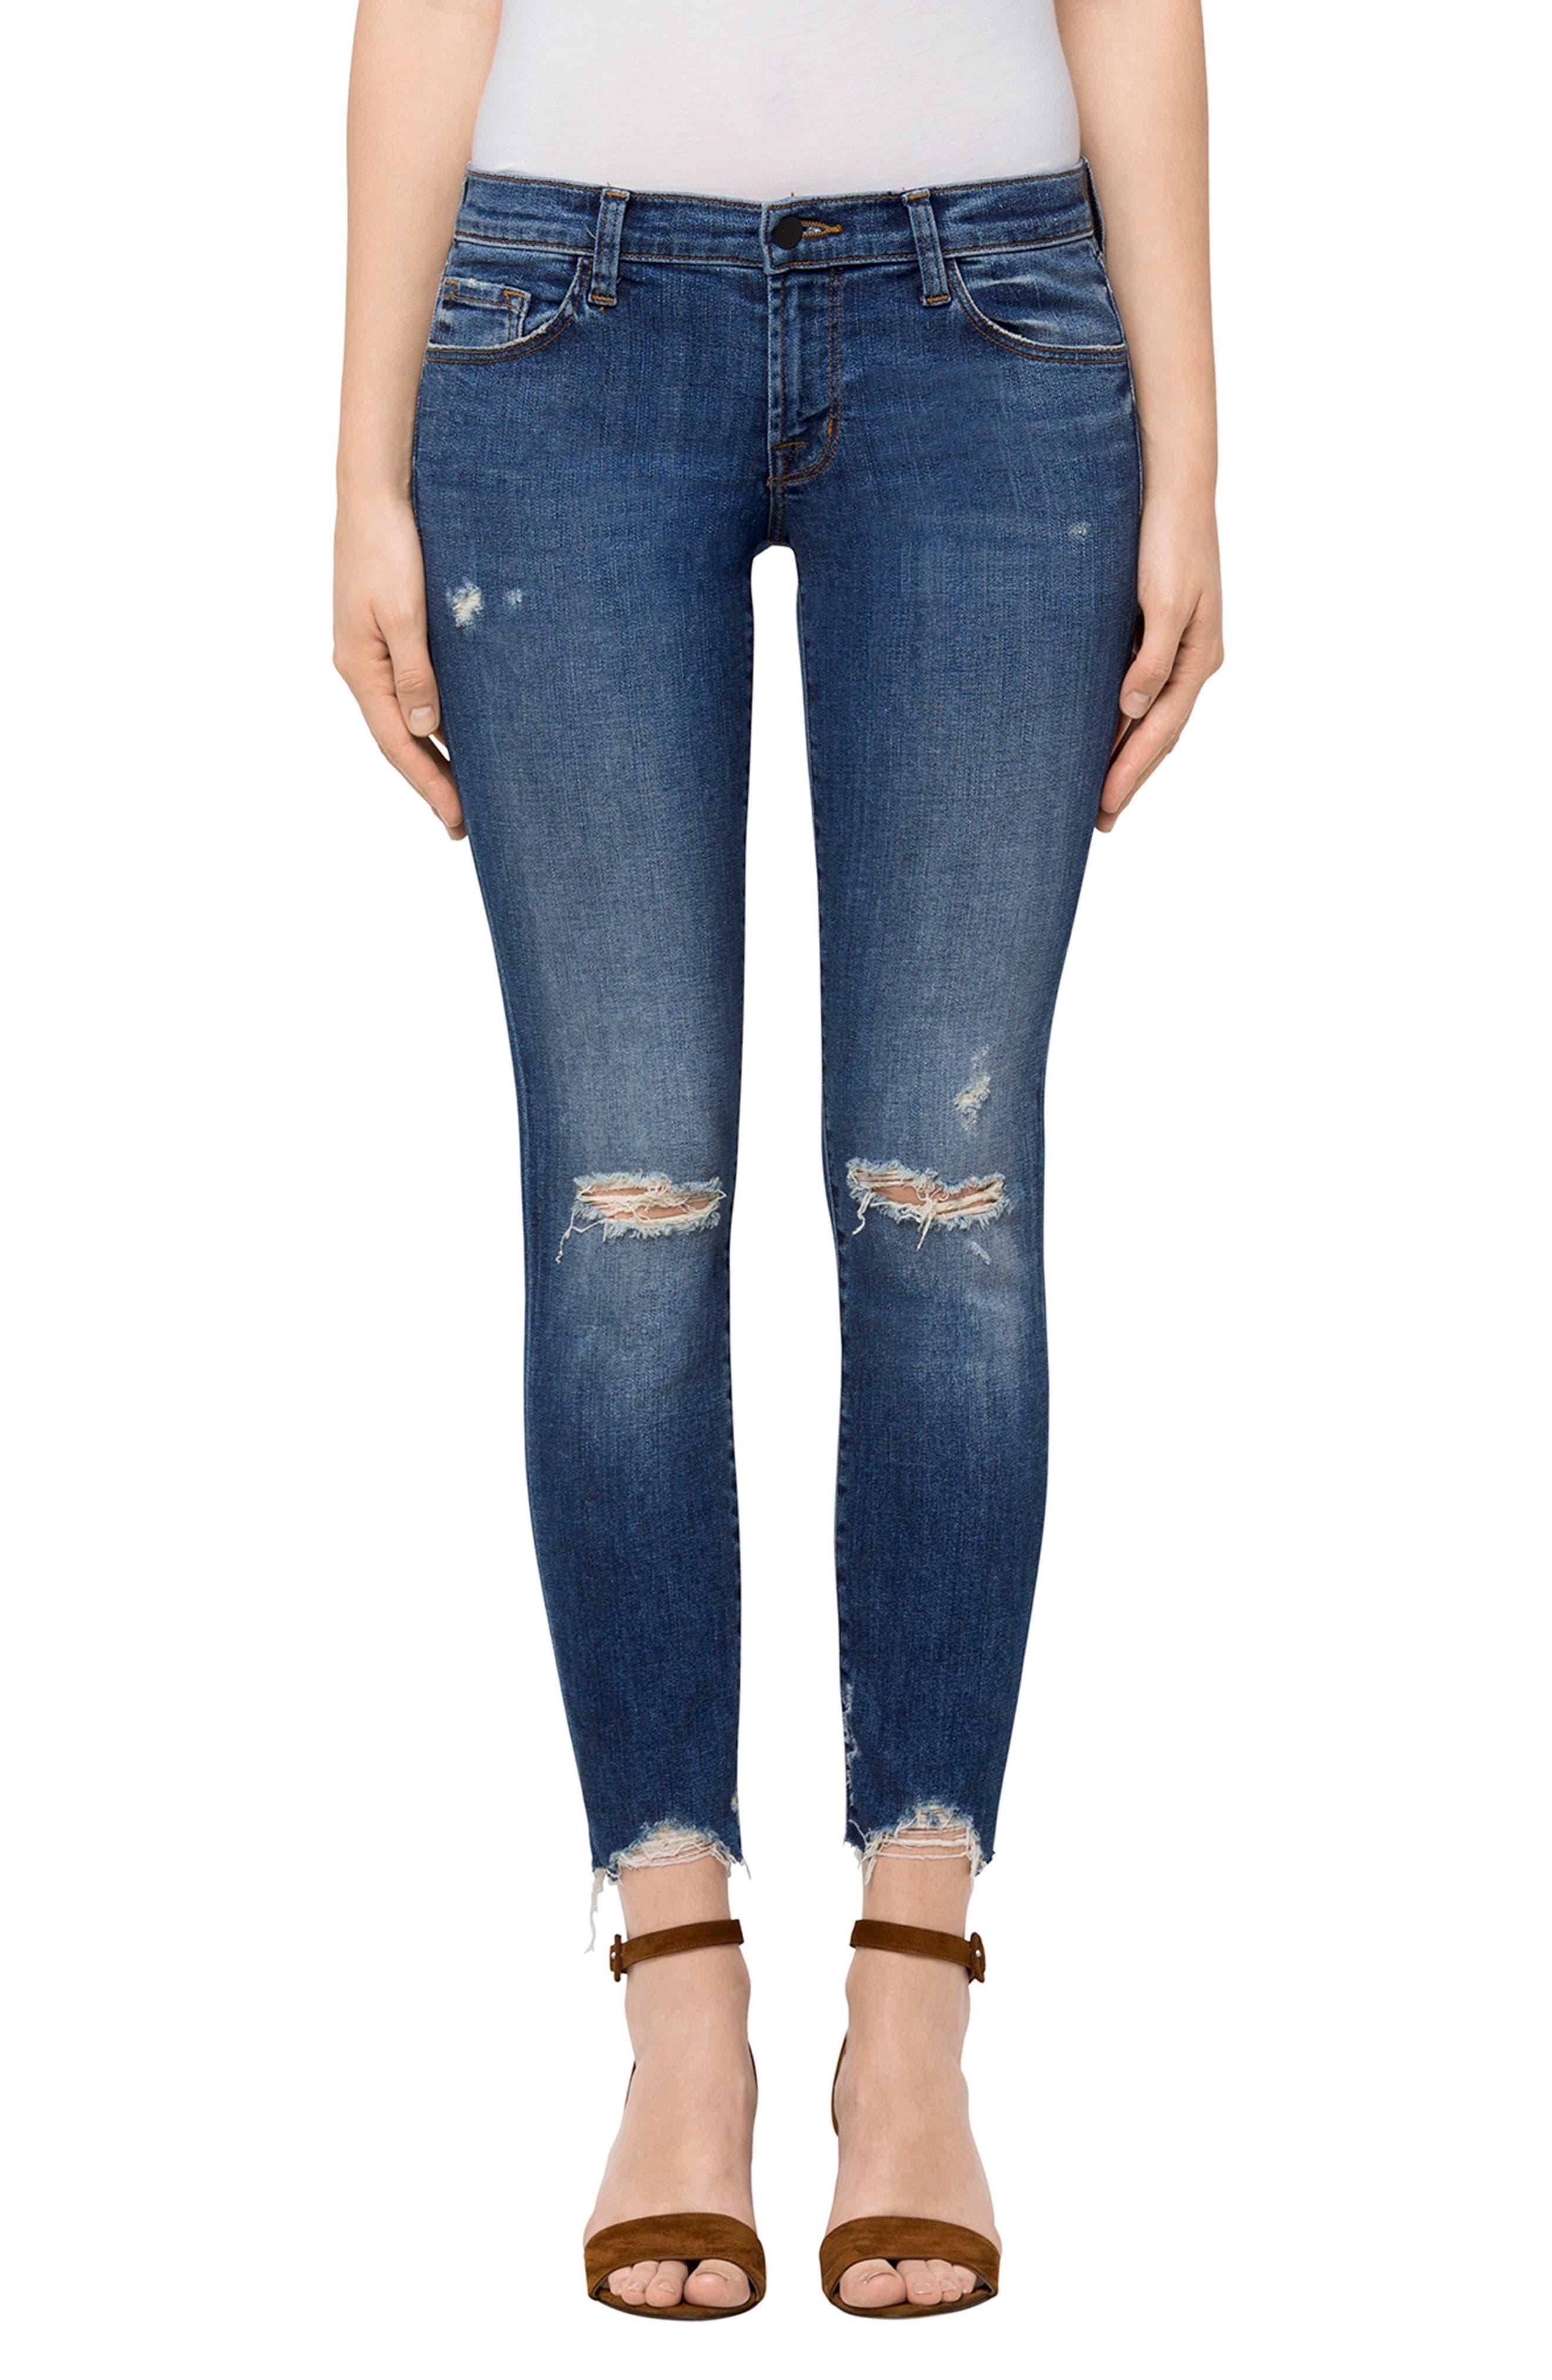 9326 Low Rise Crop Skinny Jeans,                             Main thumbnail 1, color,                             Revoke Destruct